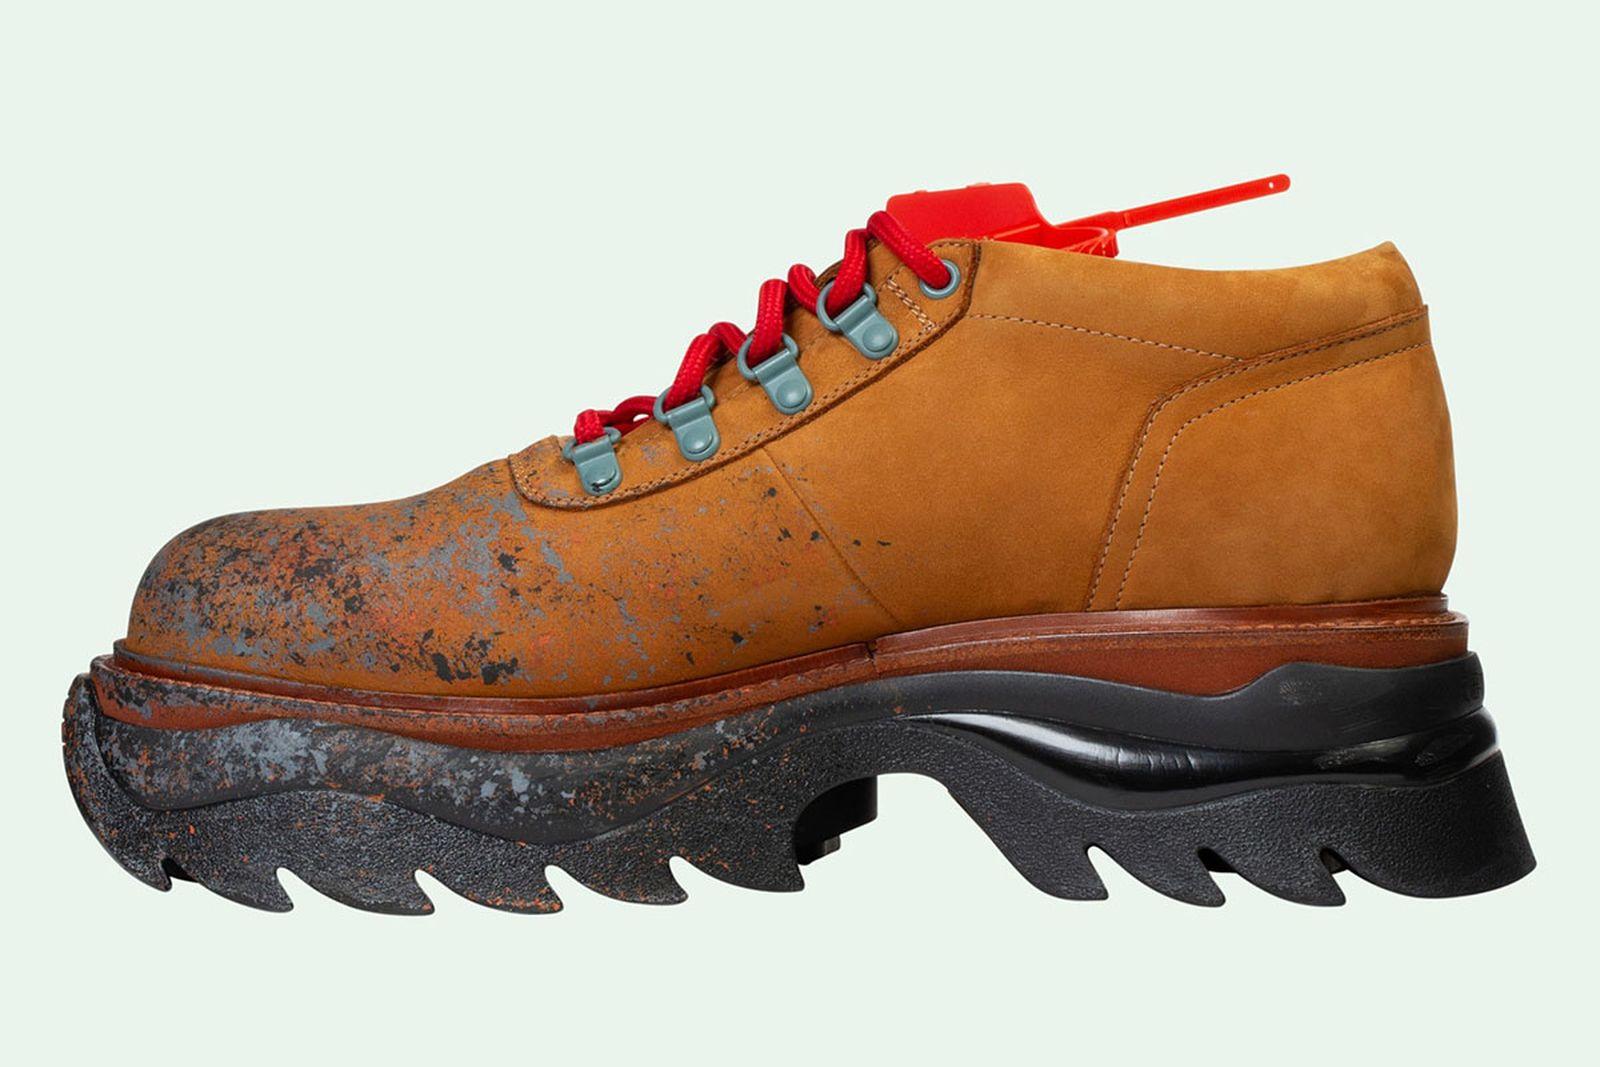 off-white-ridged-sole-sneaker-release-date-price-07